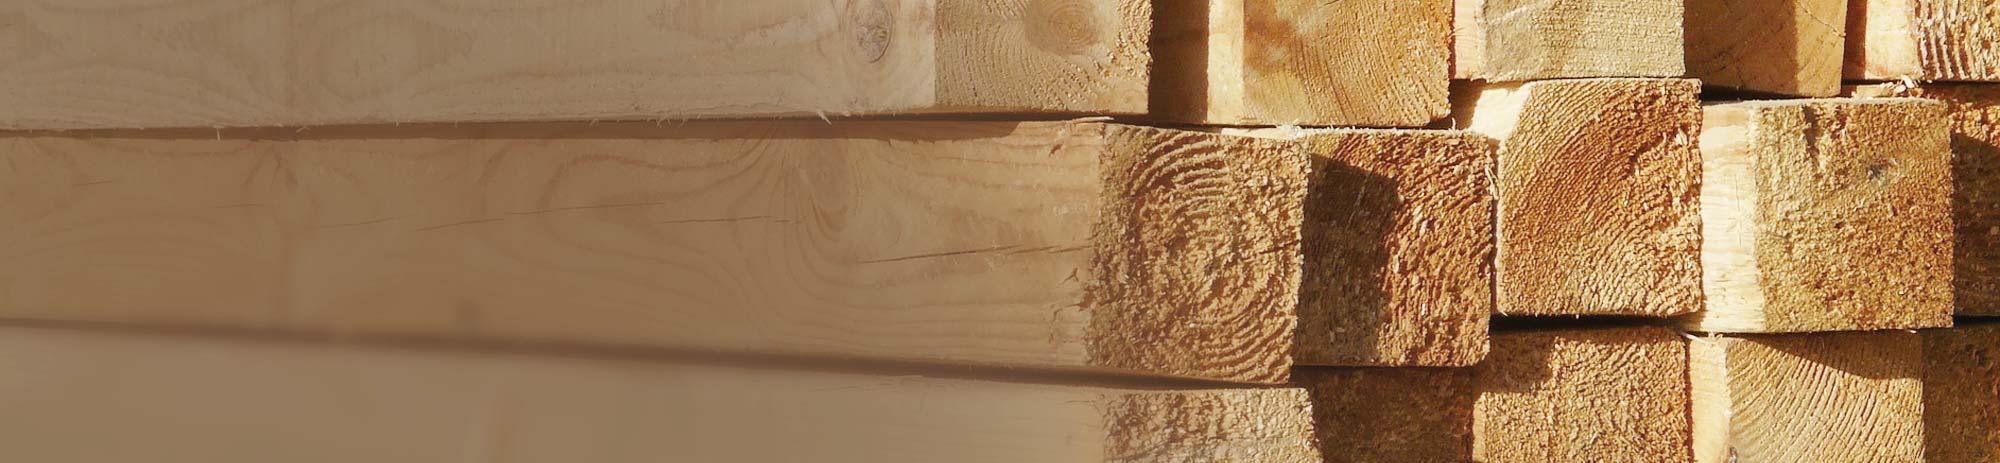 Holz aus Leidenschaft - Fritz Hesse GmbH & Co. KG